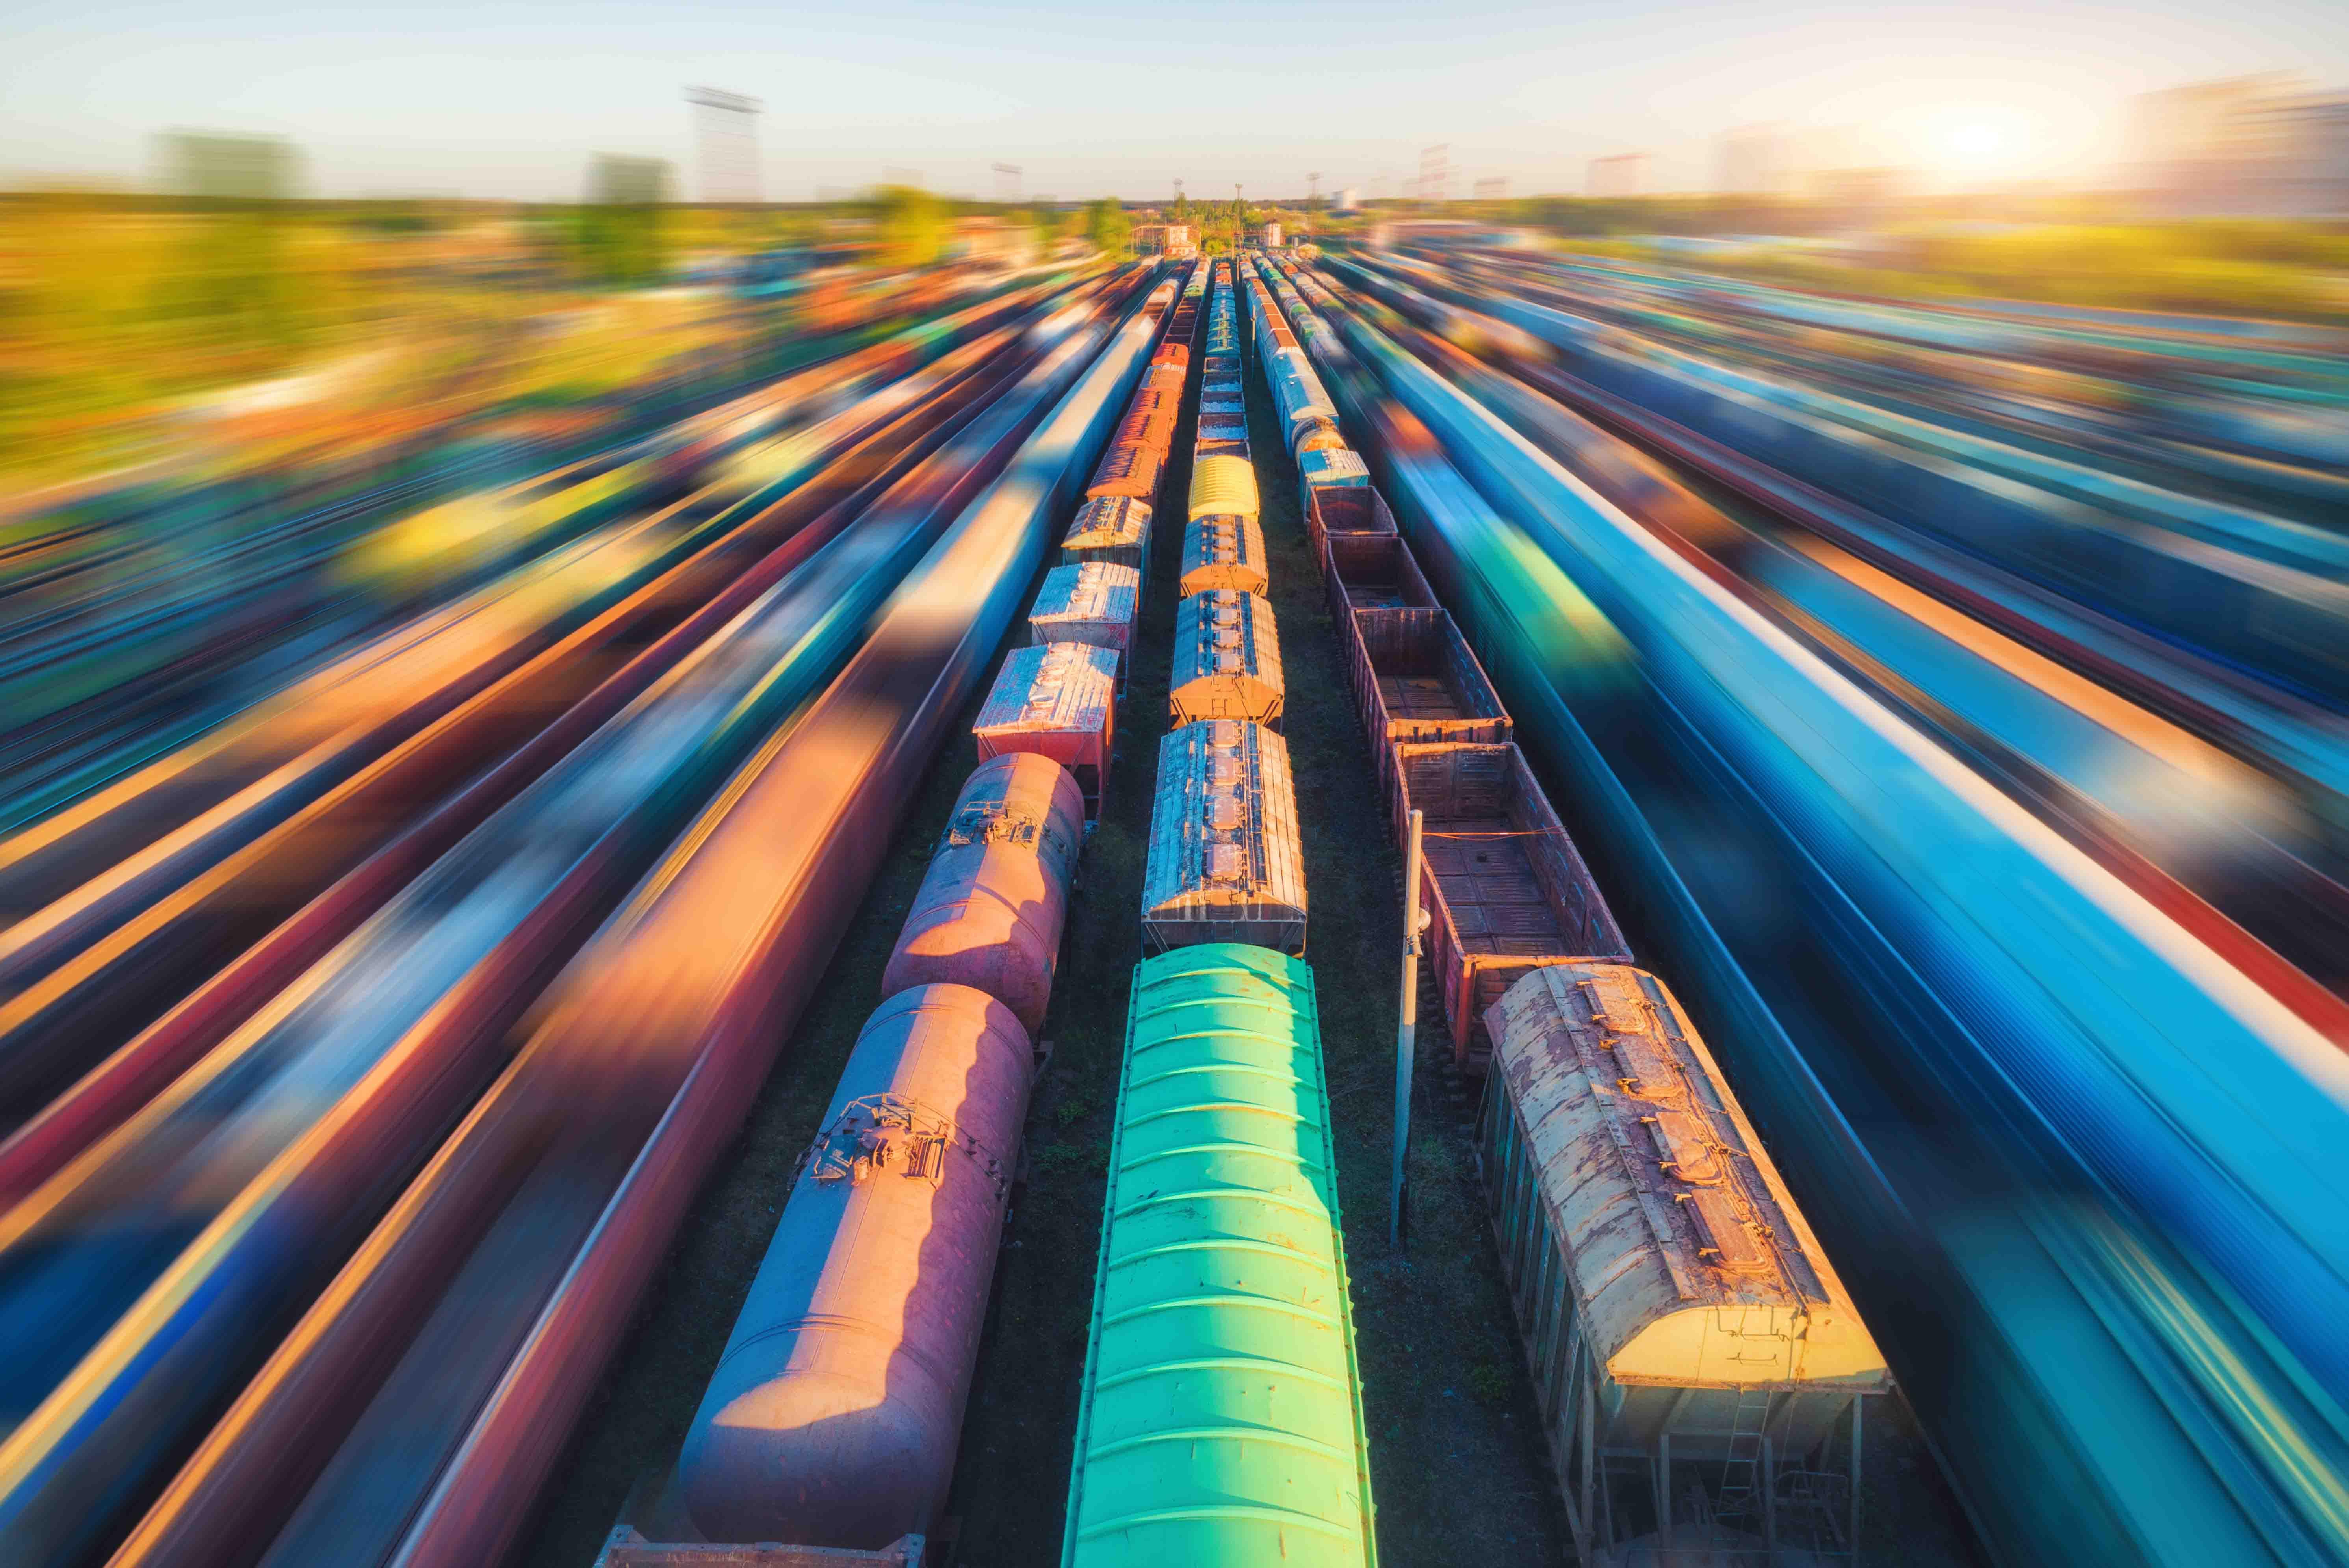 Railcar reflection bakglos Atlas Logistic Netw